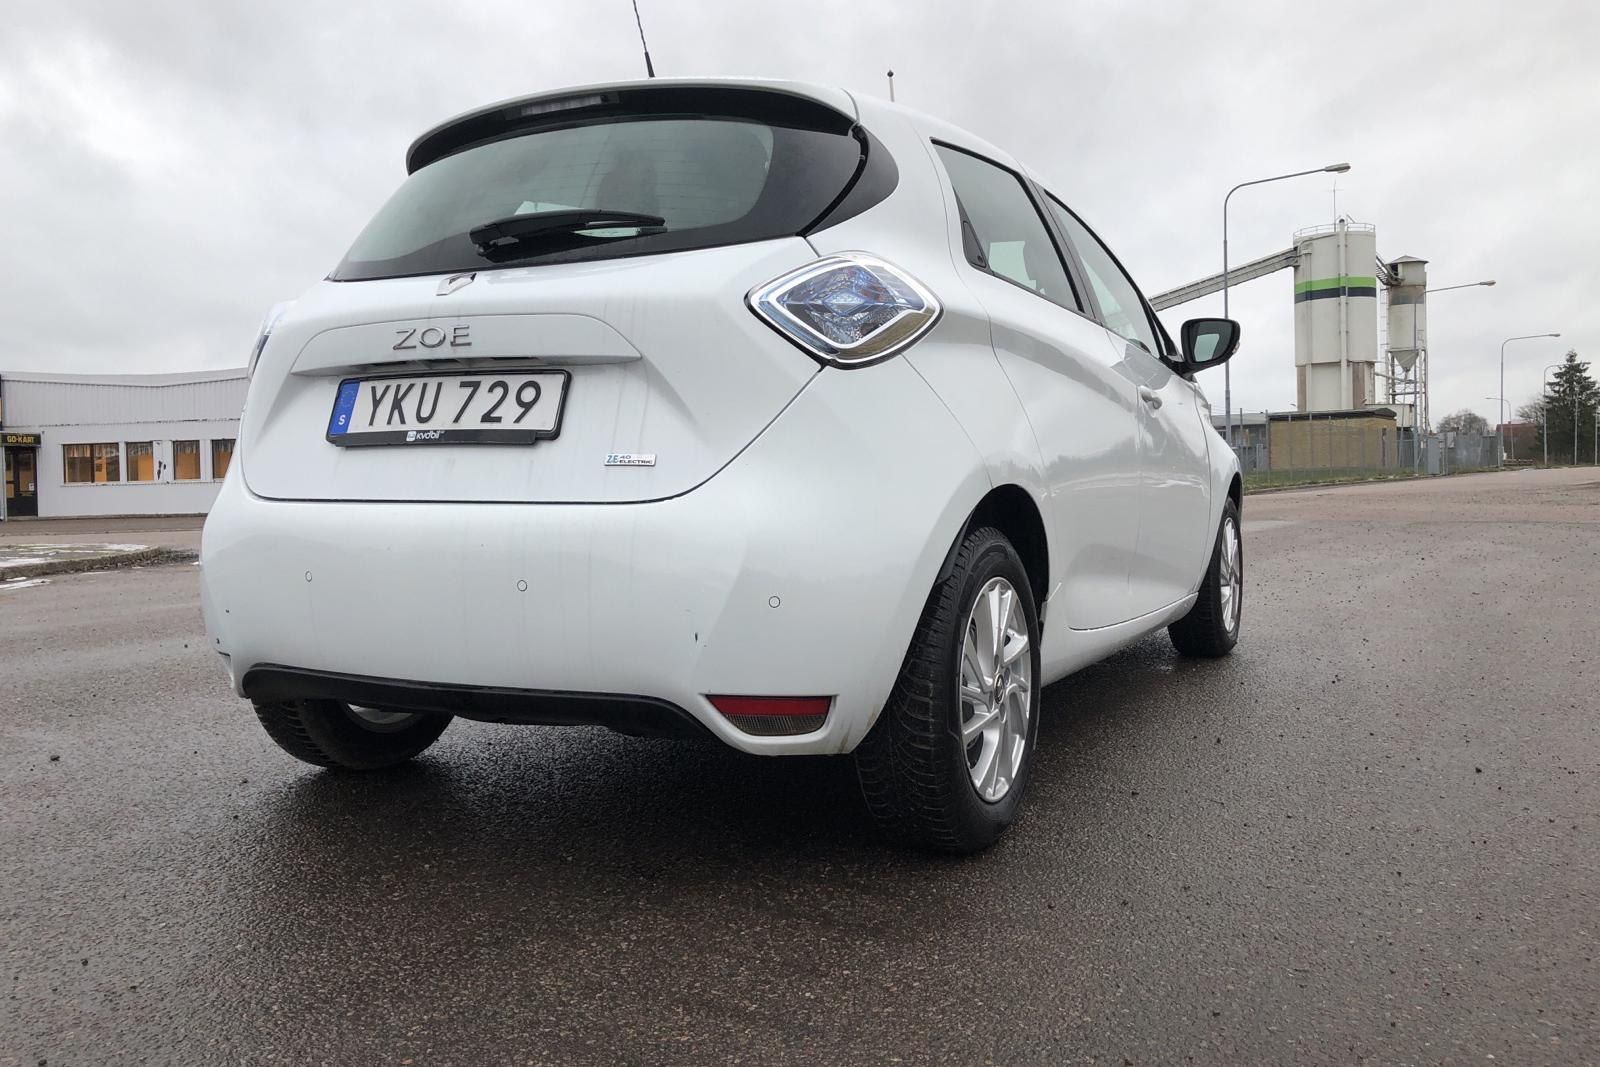 Renault Zoe 41 kWh R90 (92hk) - 72 780 km - Automatic - white - 2019